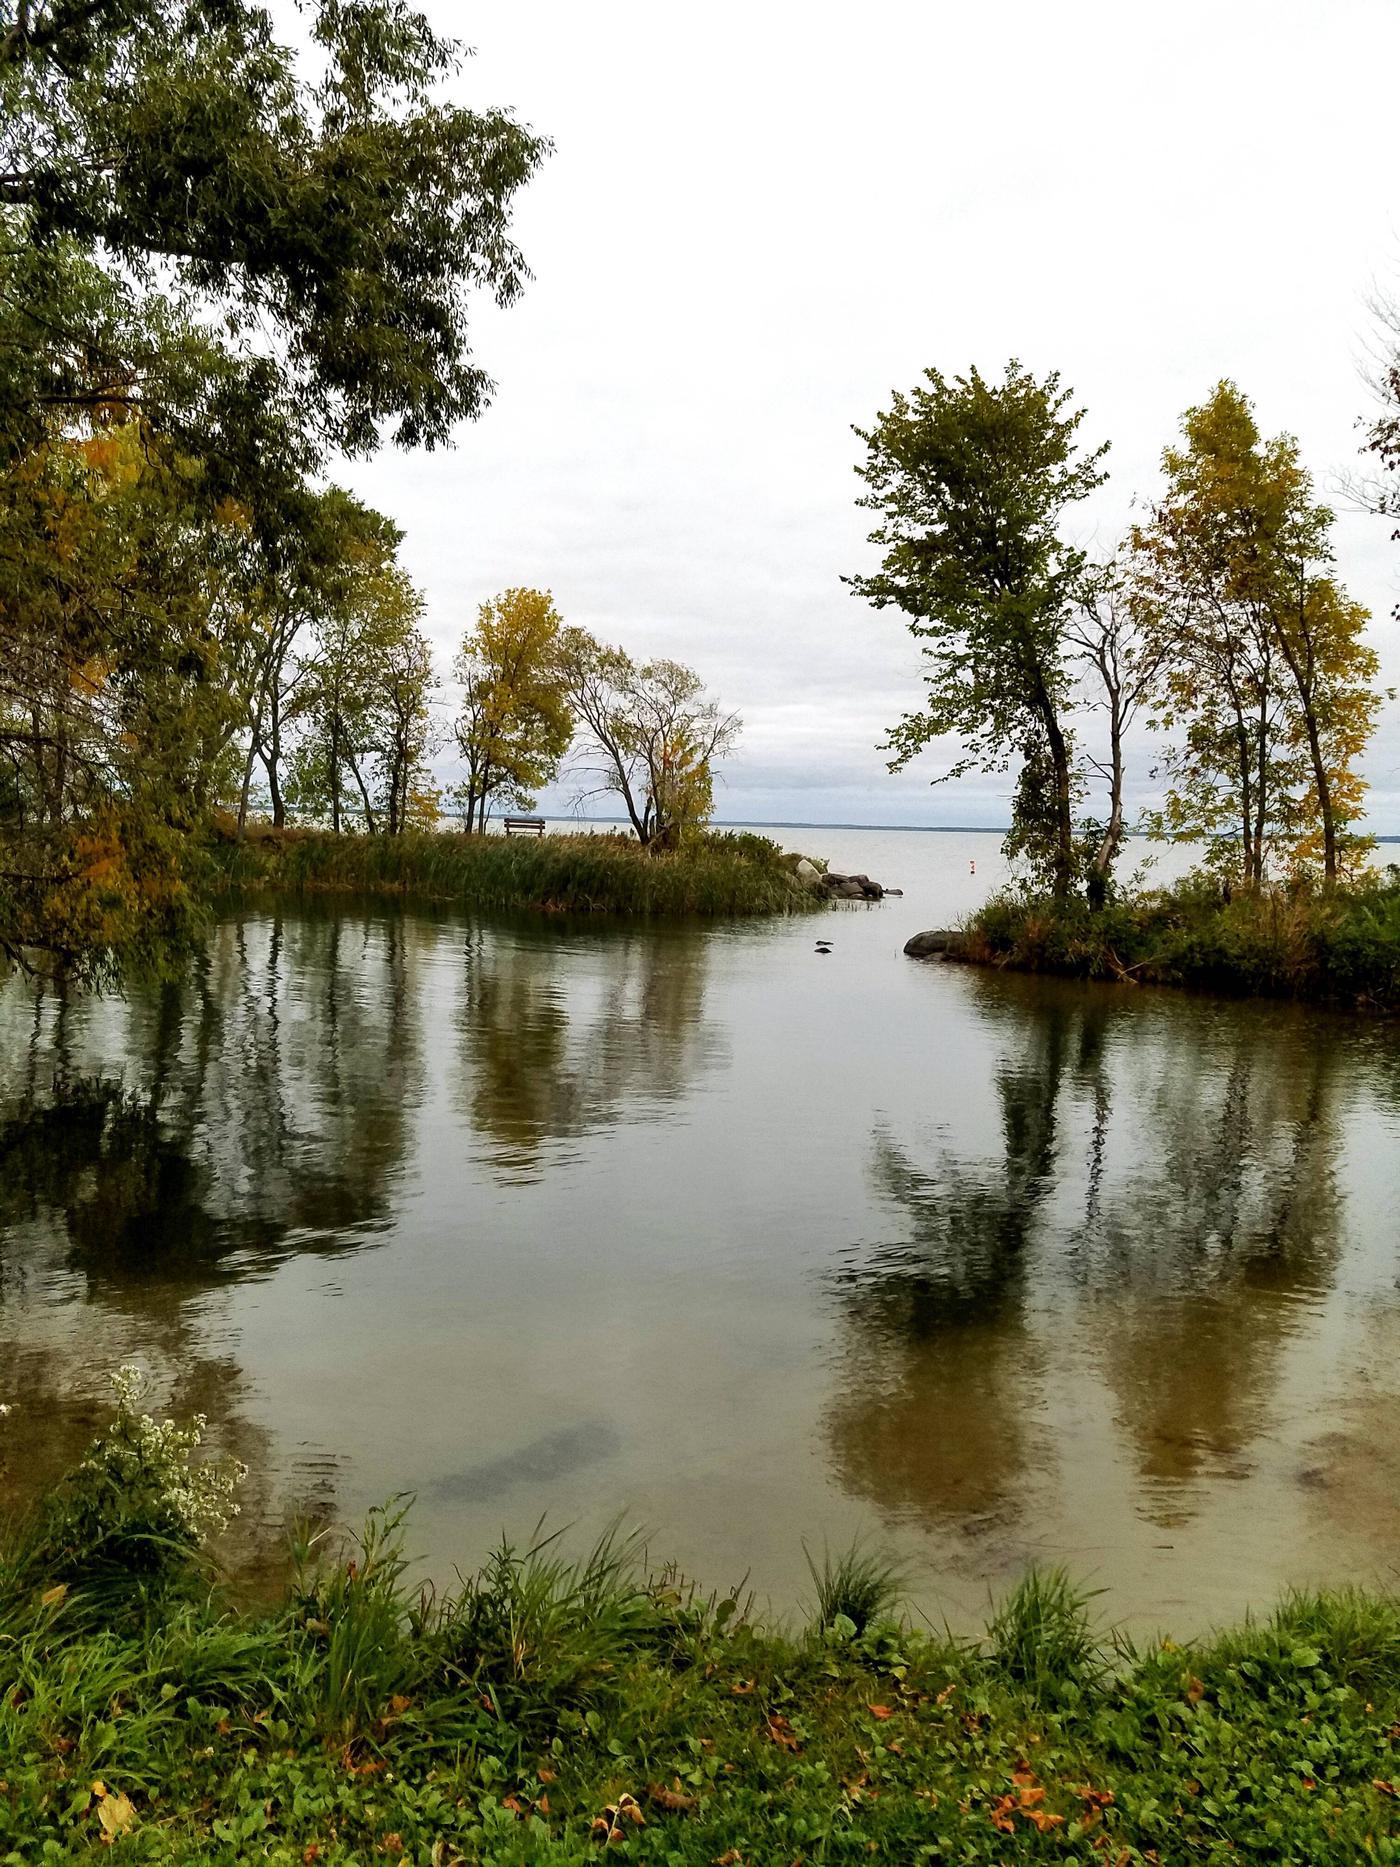 Stony Point Chippewa National Forest